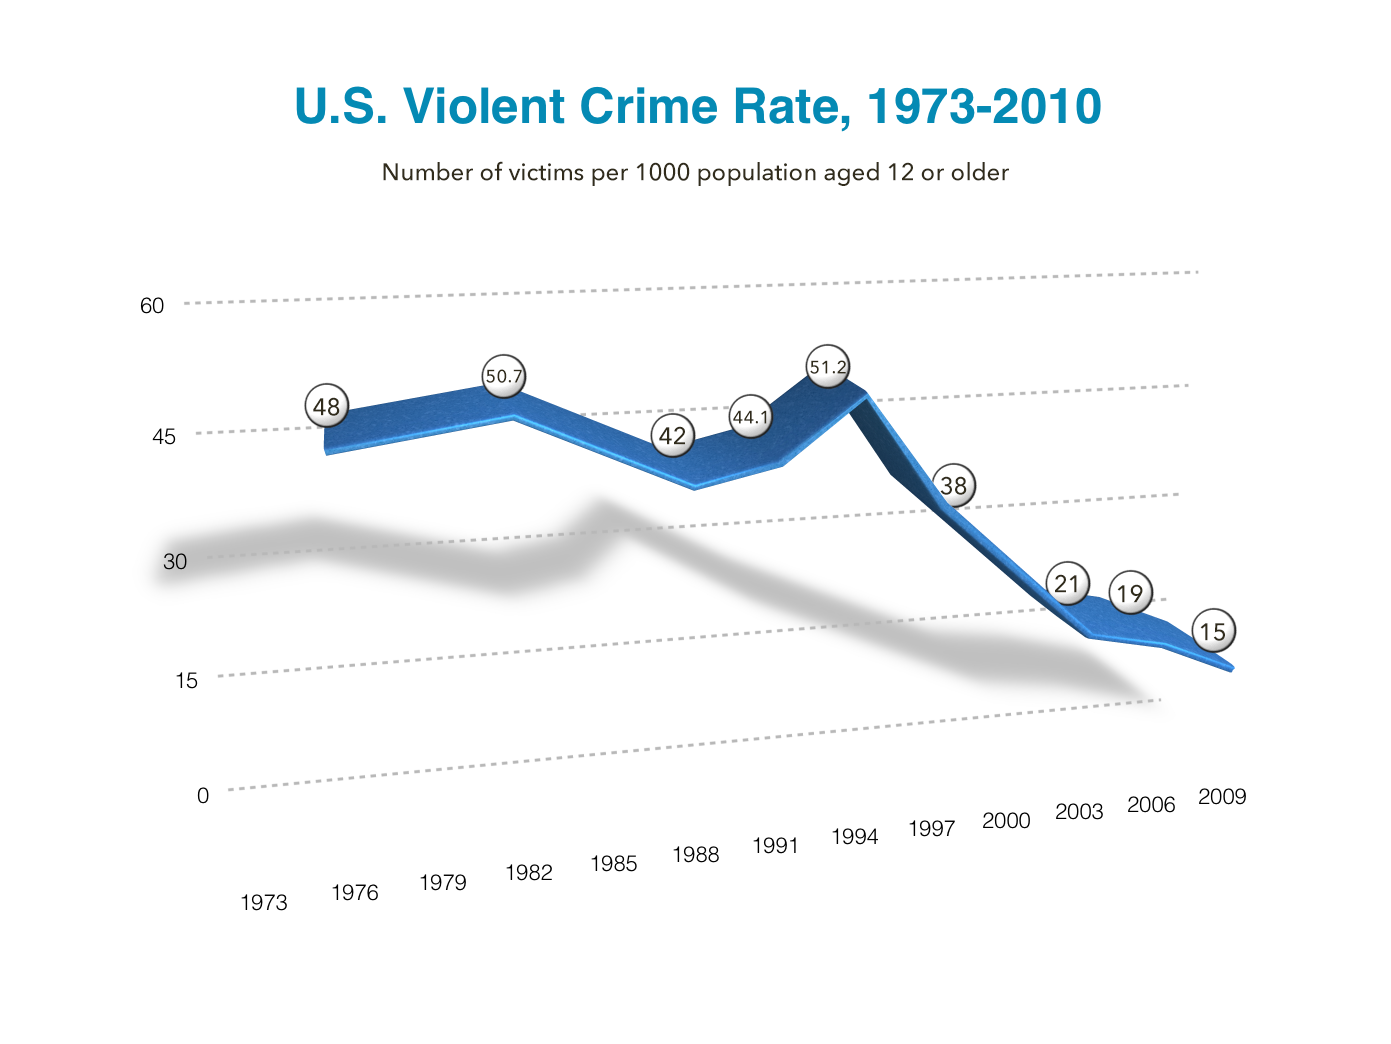 U.S. Violent Crime Rate 1973-2010